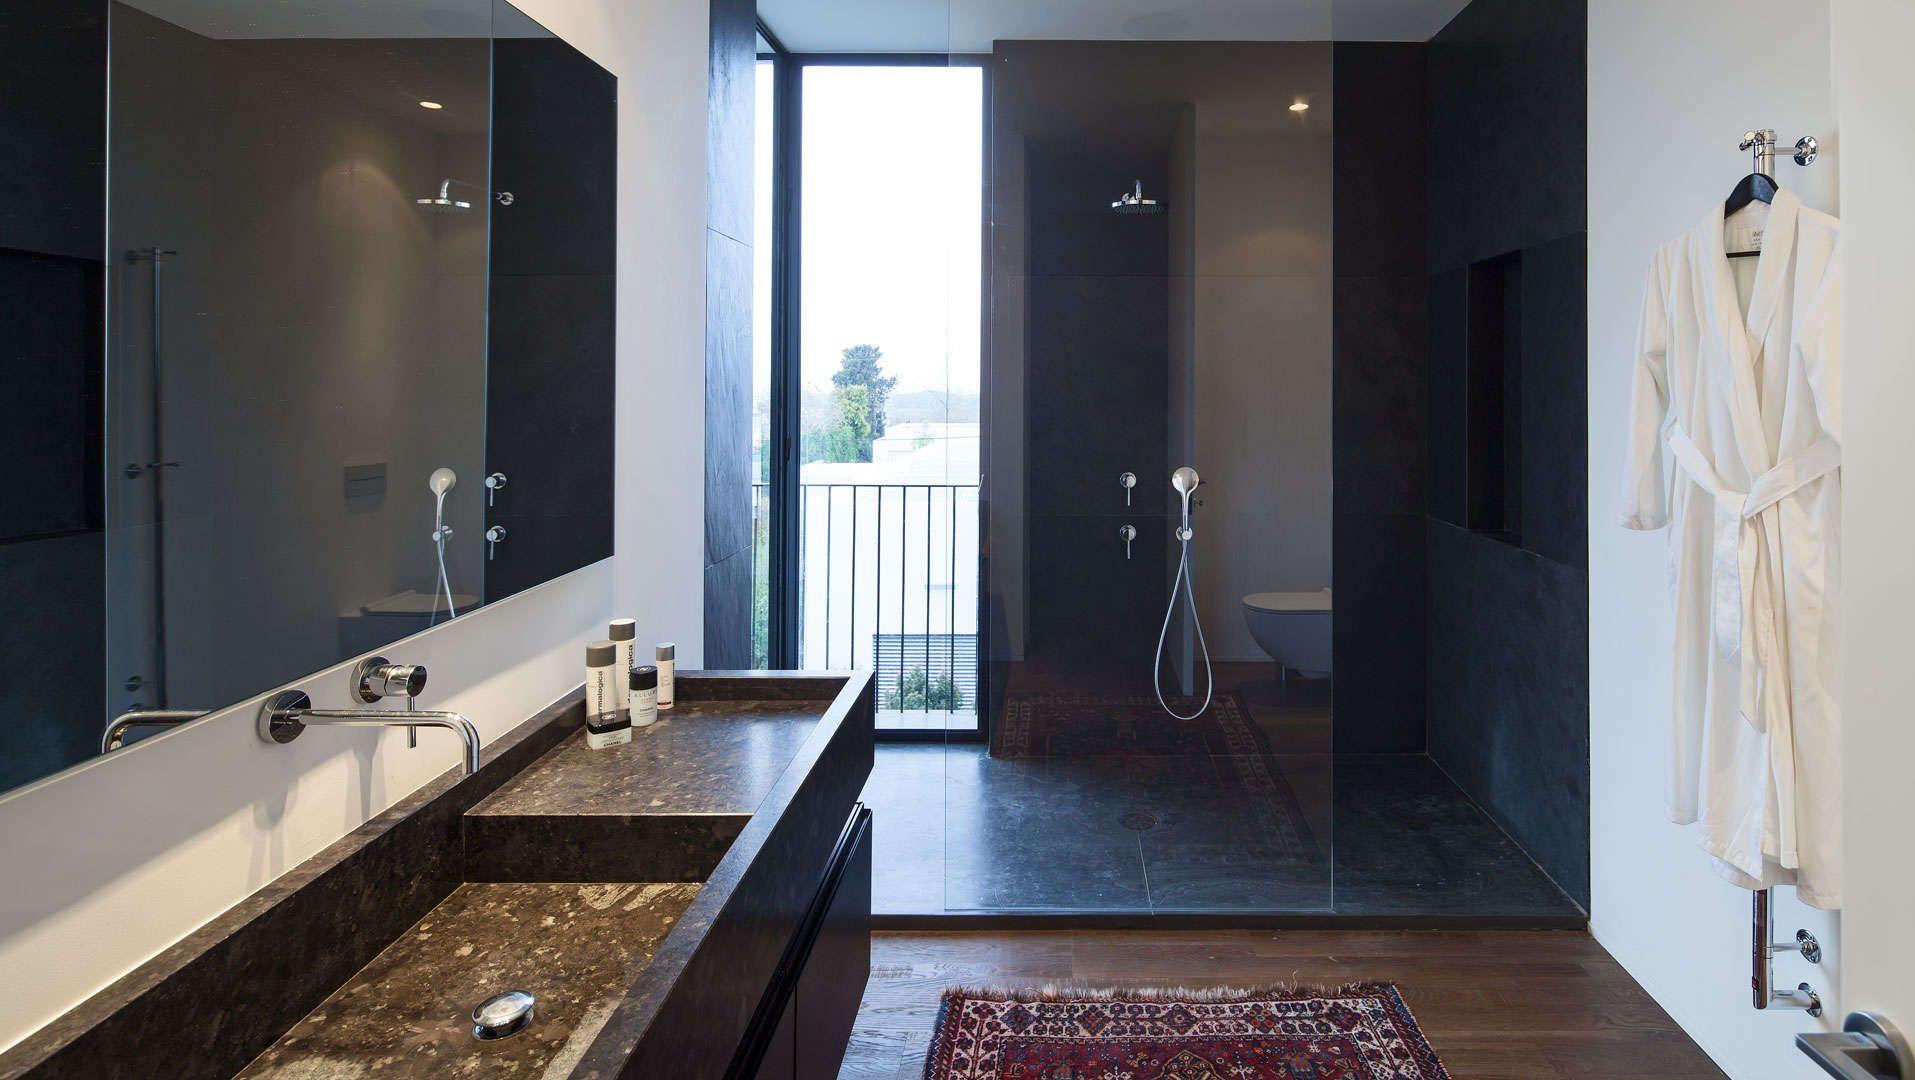 Pin By Michal Matalon Homemaker On Bathrooms - Pinterest -